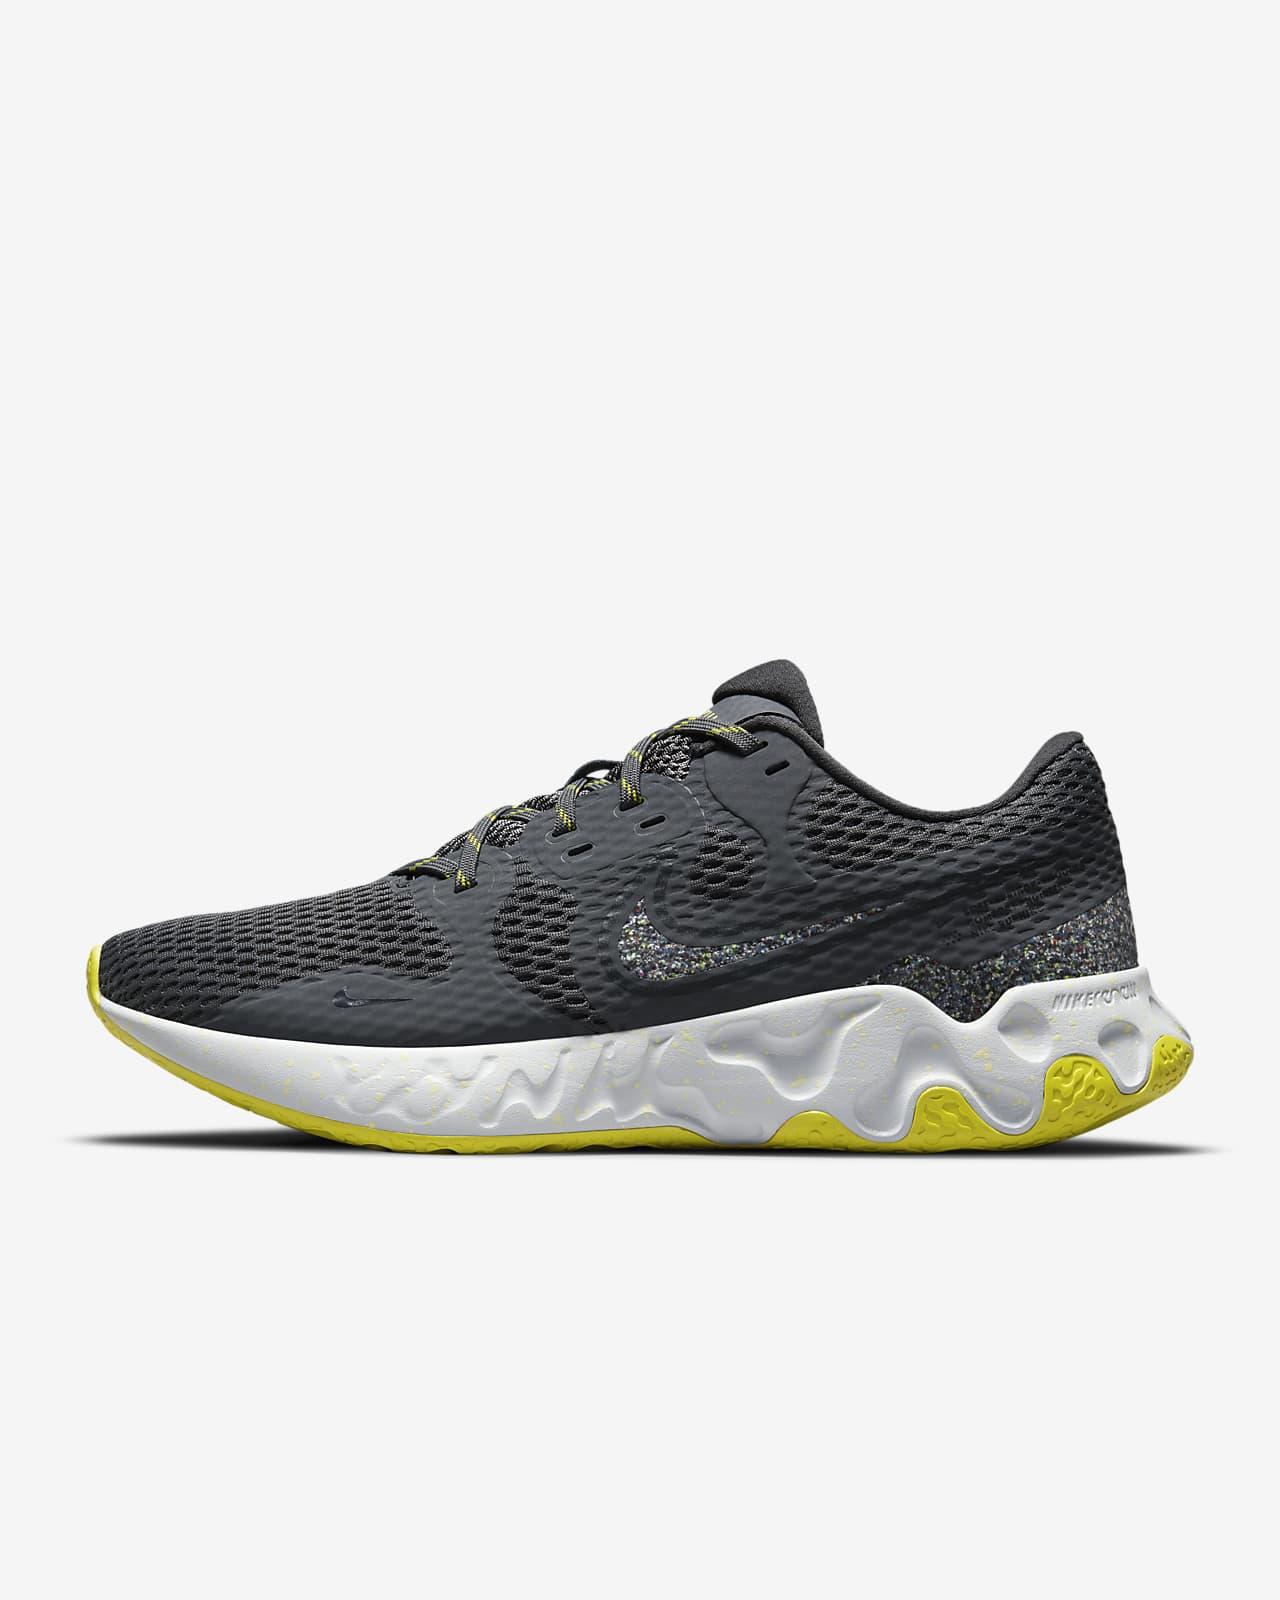 Calzado de running para hombre Nike Renew Ride 2 Premium